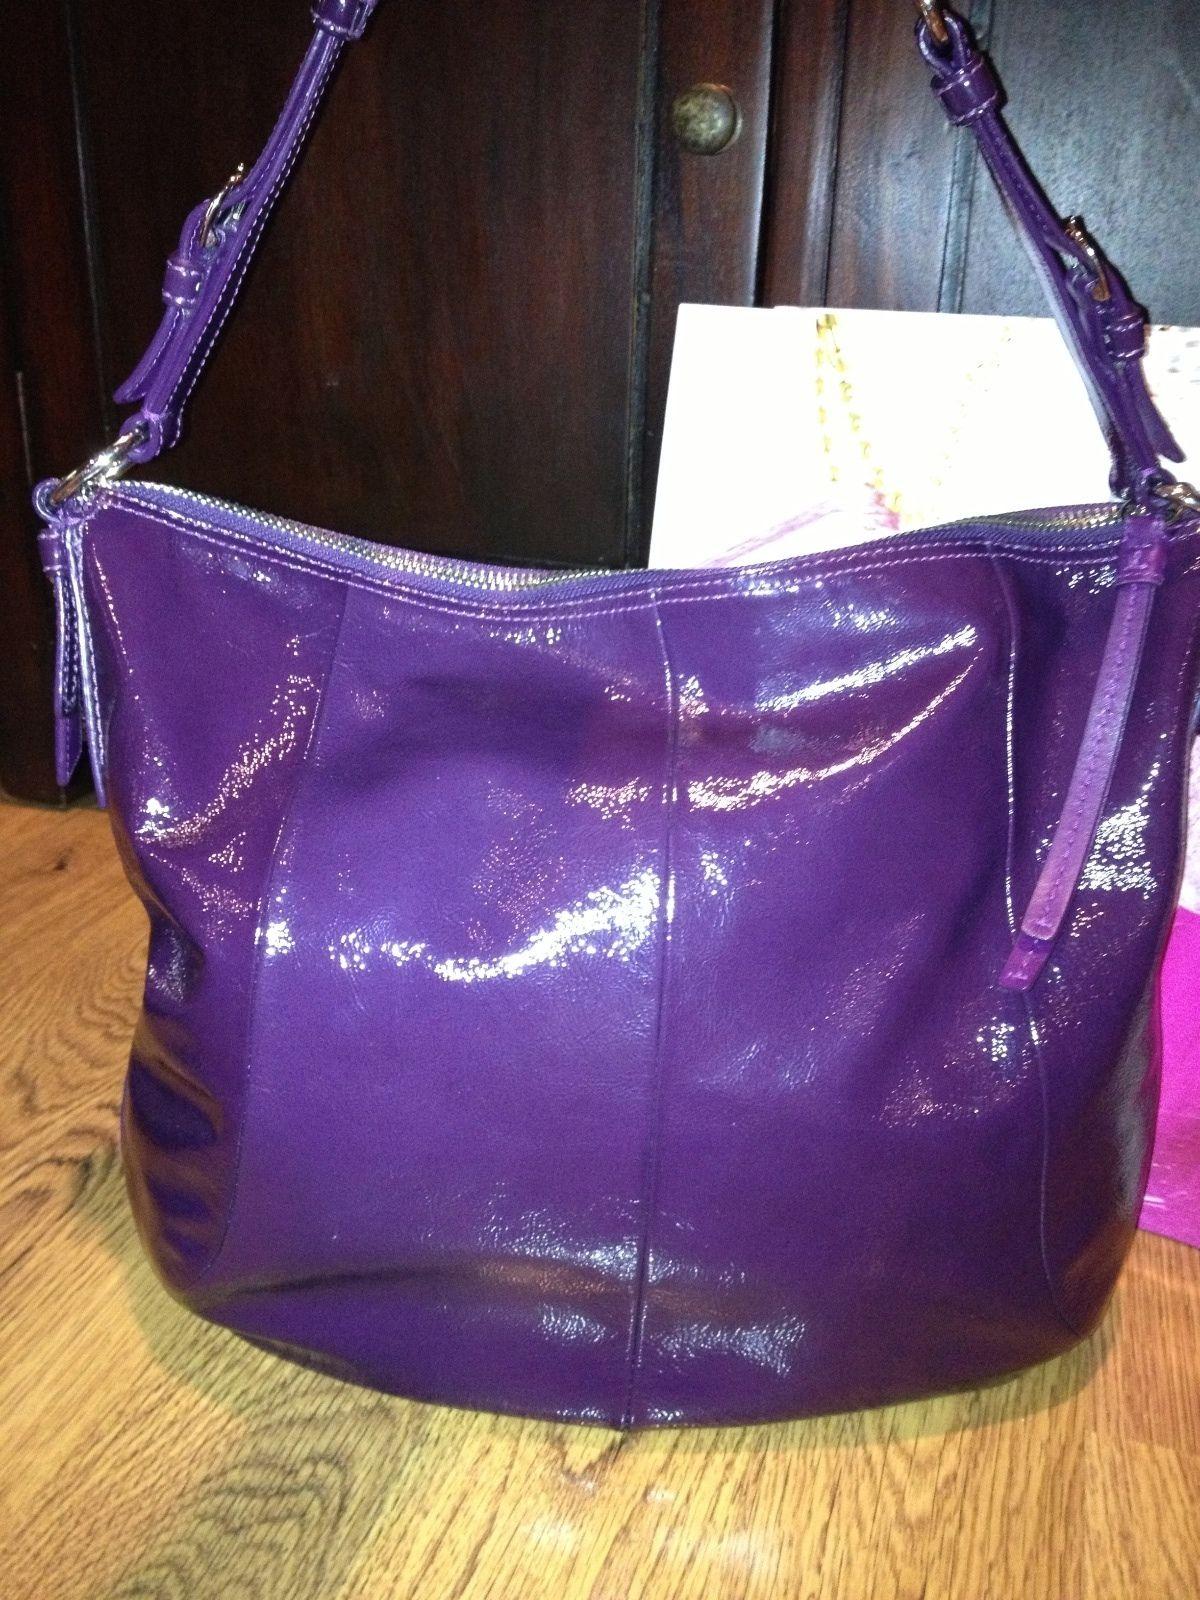 Coach 12687 Soho Purple Plum Crinkle Patent Hobo Bag Shoulder Tote Duffle  Purse   eBay e2cf9a61a6